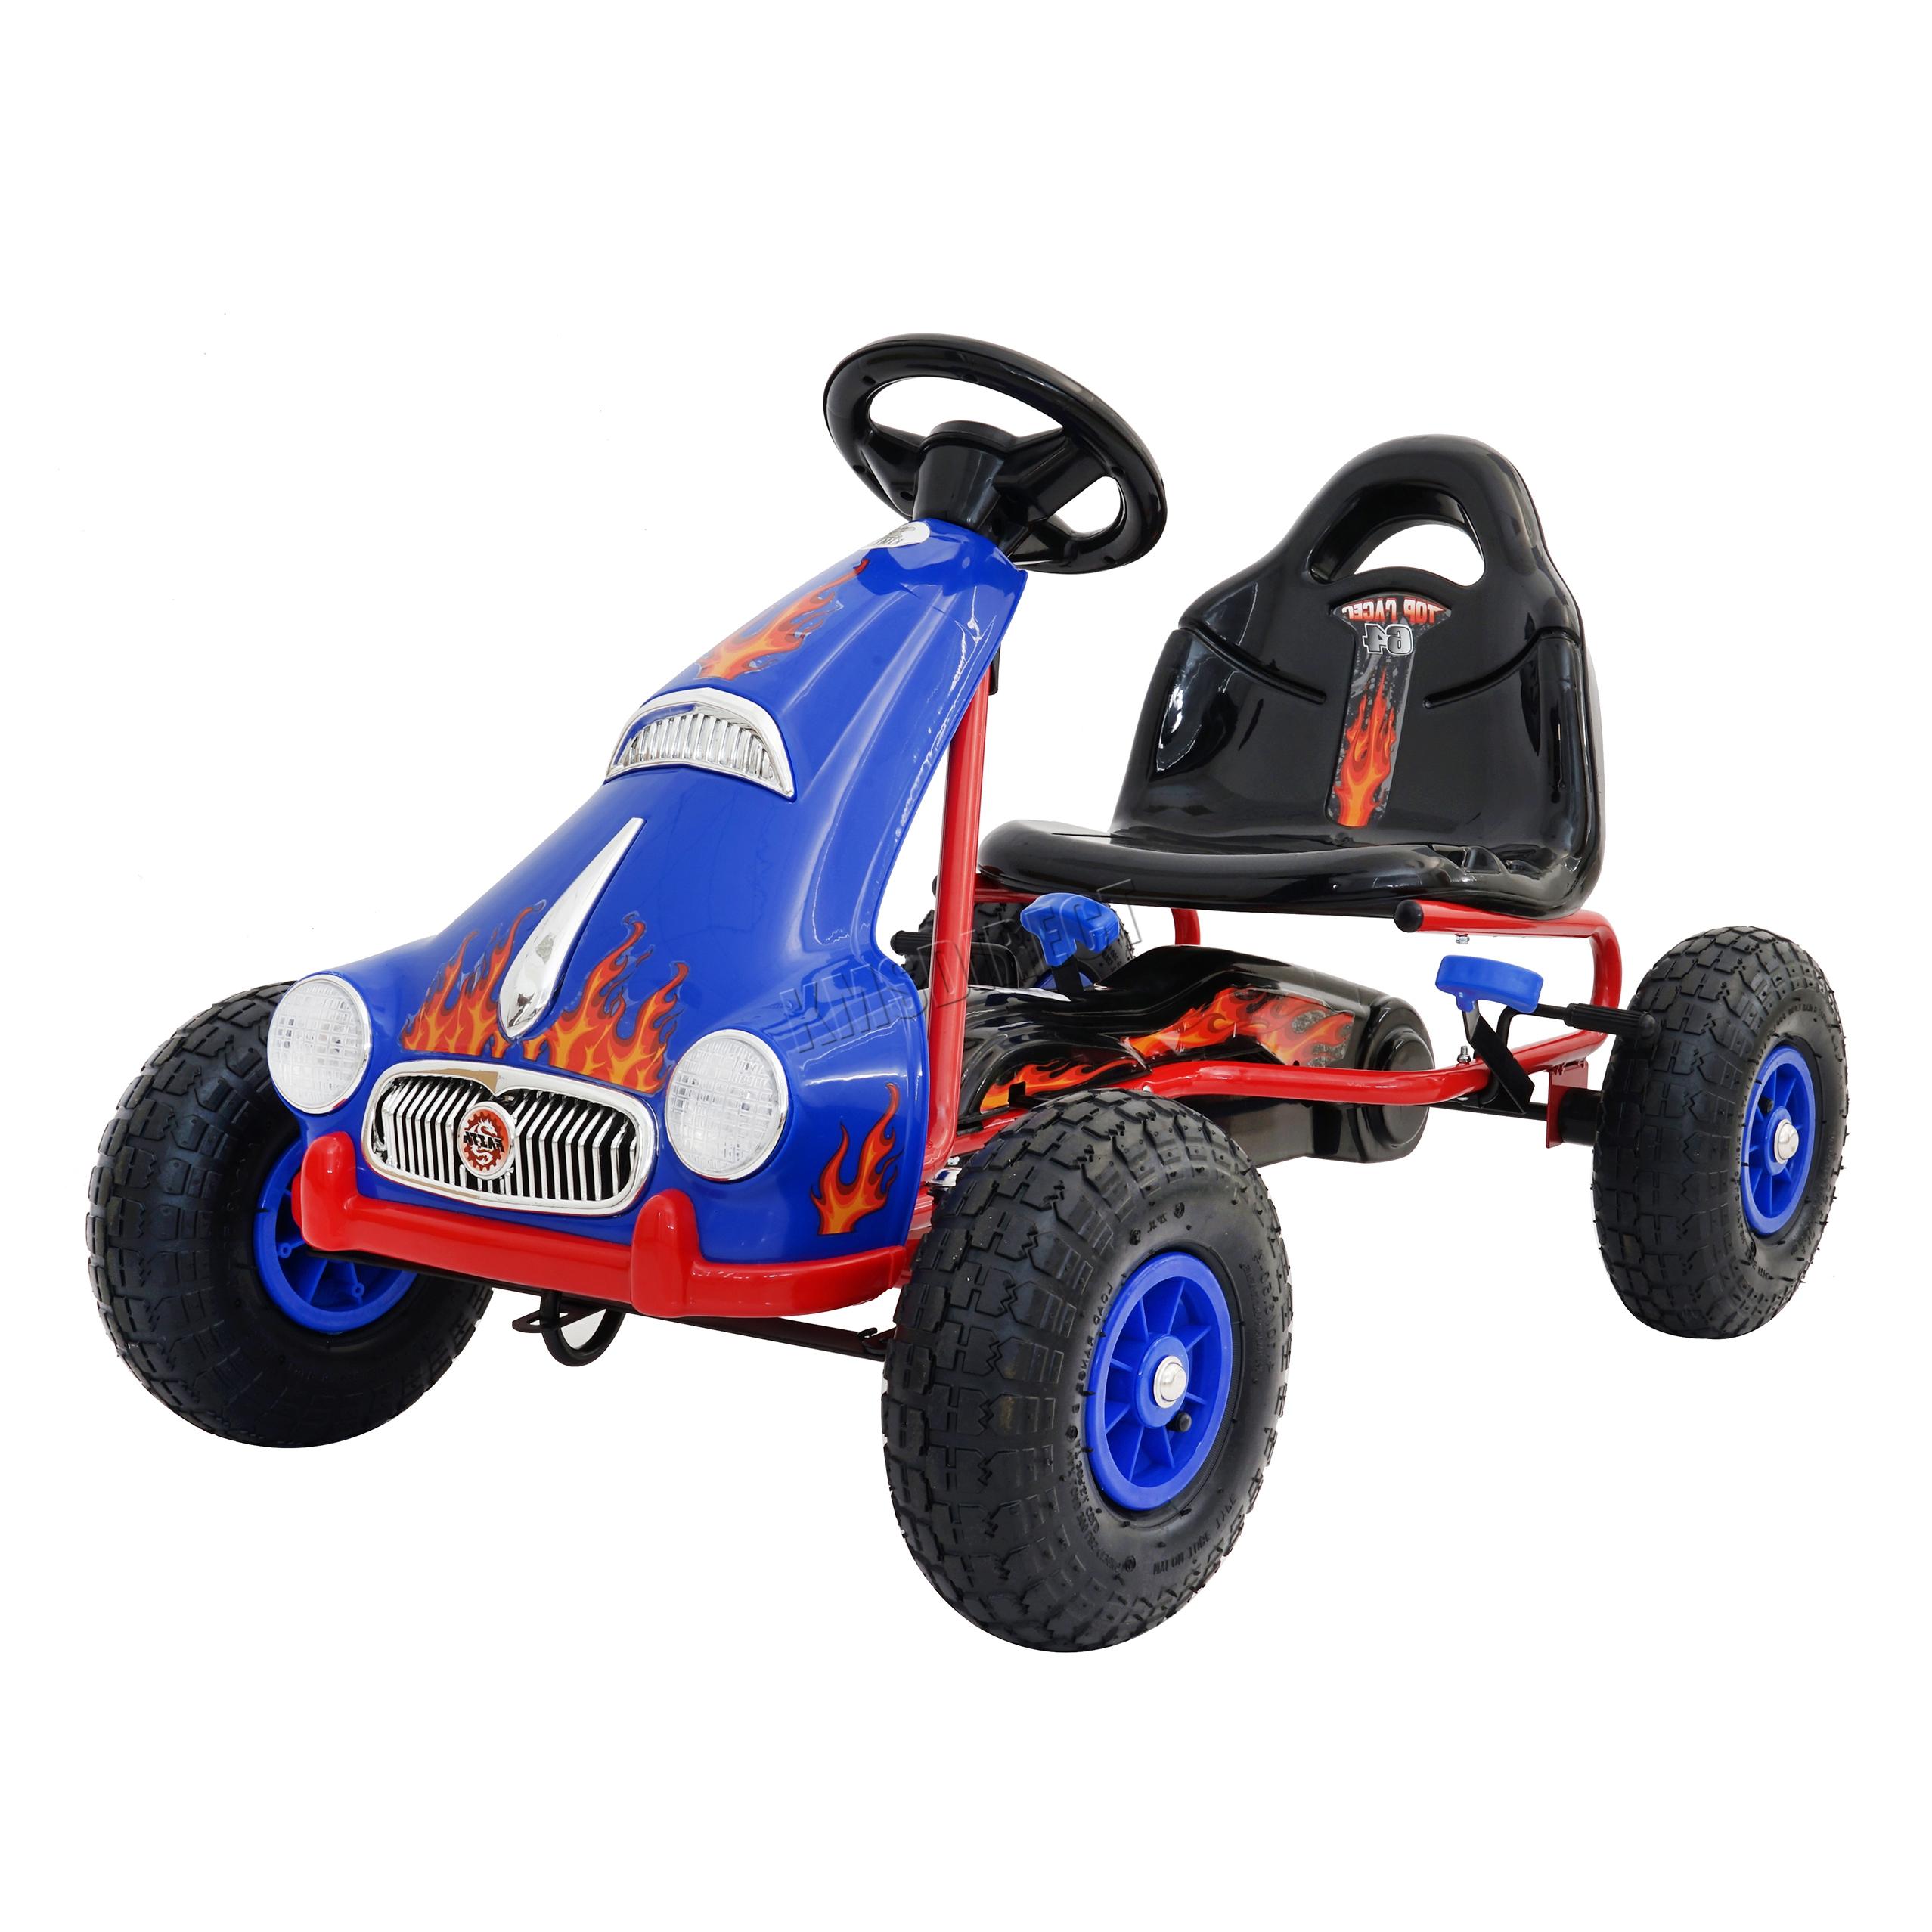 FoxHunter infantil Go Kart CORREPASILLOS COCHE GOMA PEDAL ruedas ...